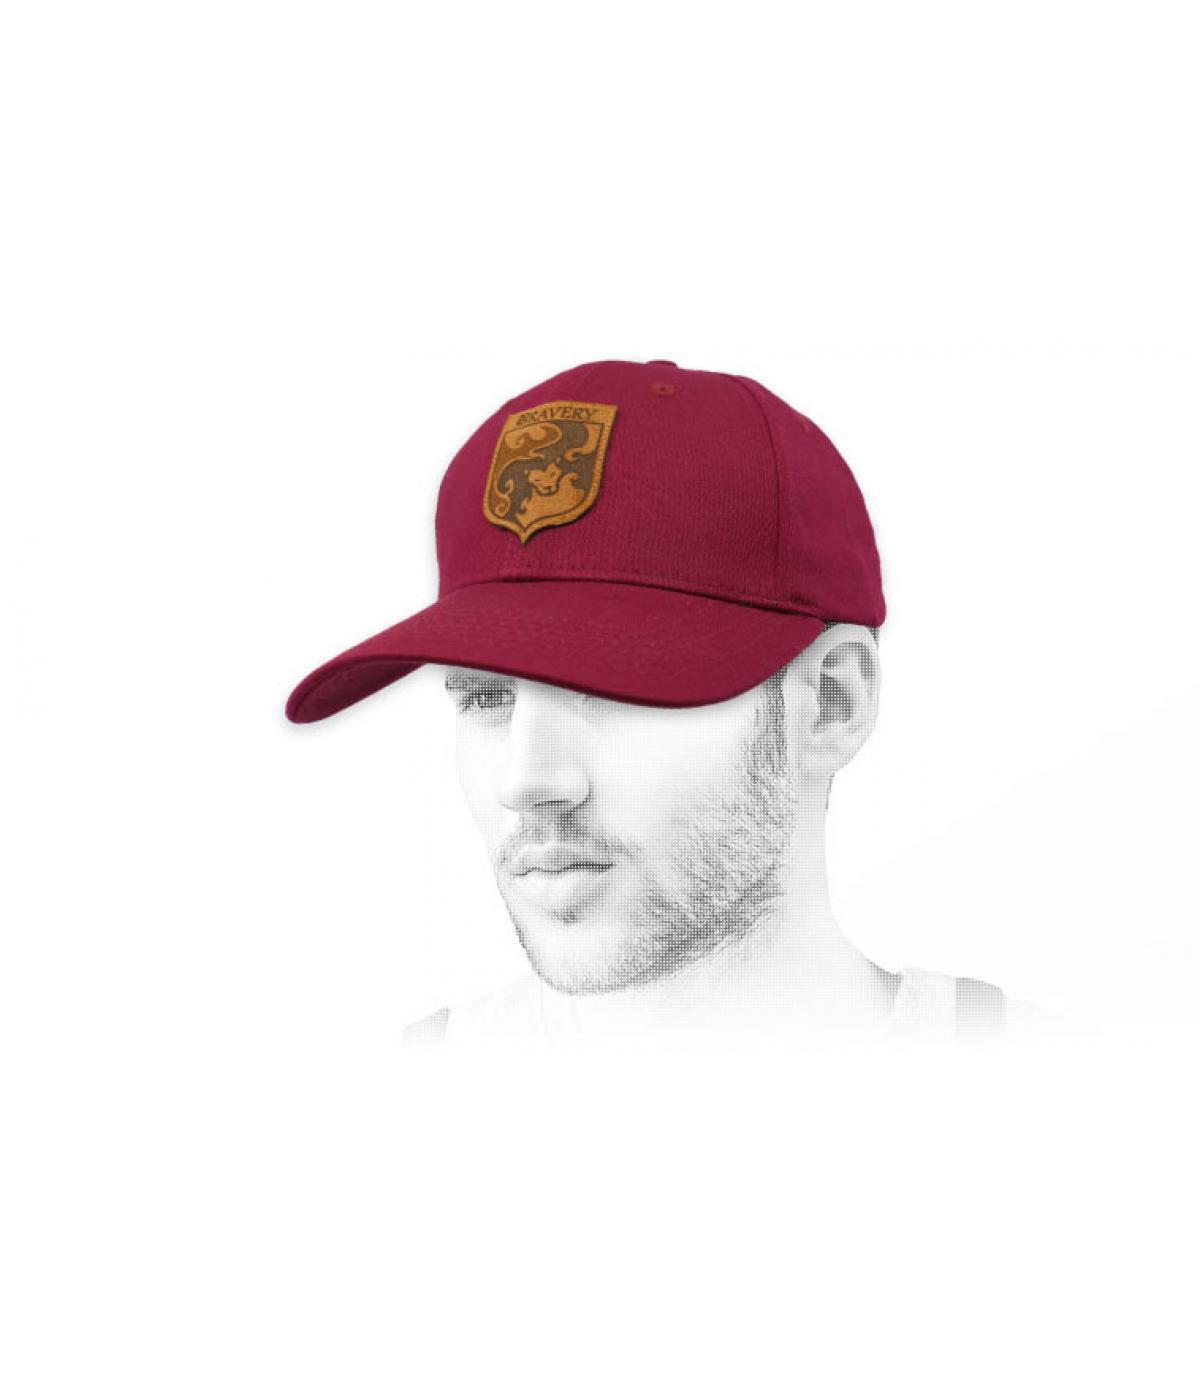 burgundy bravery cap